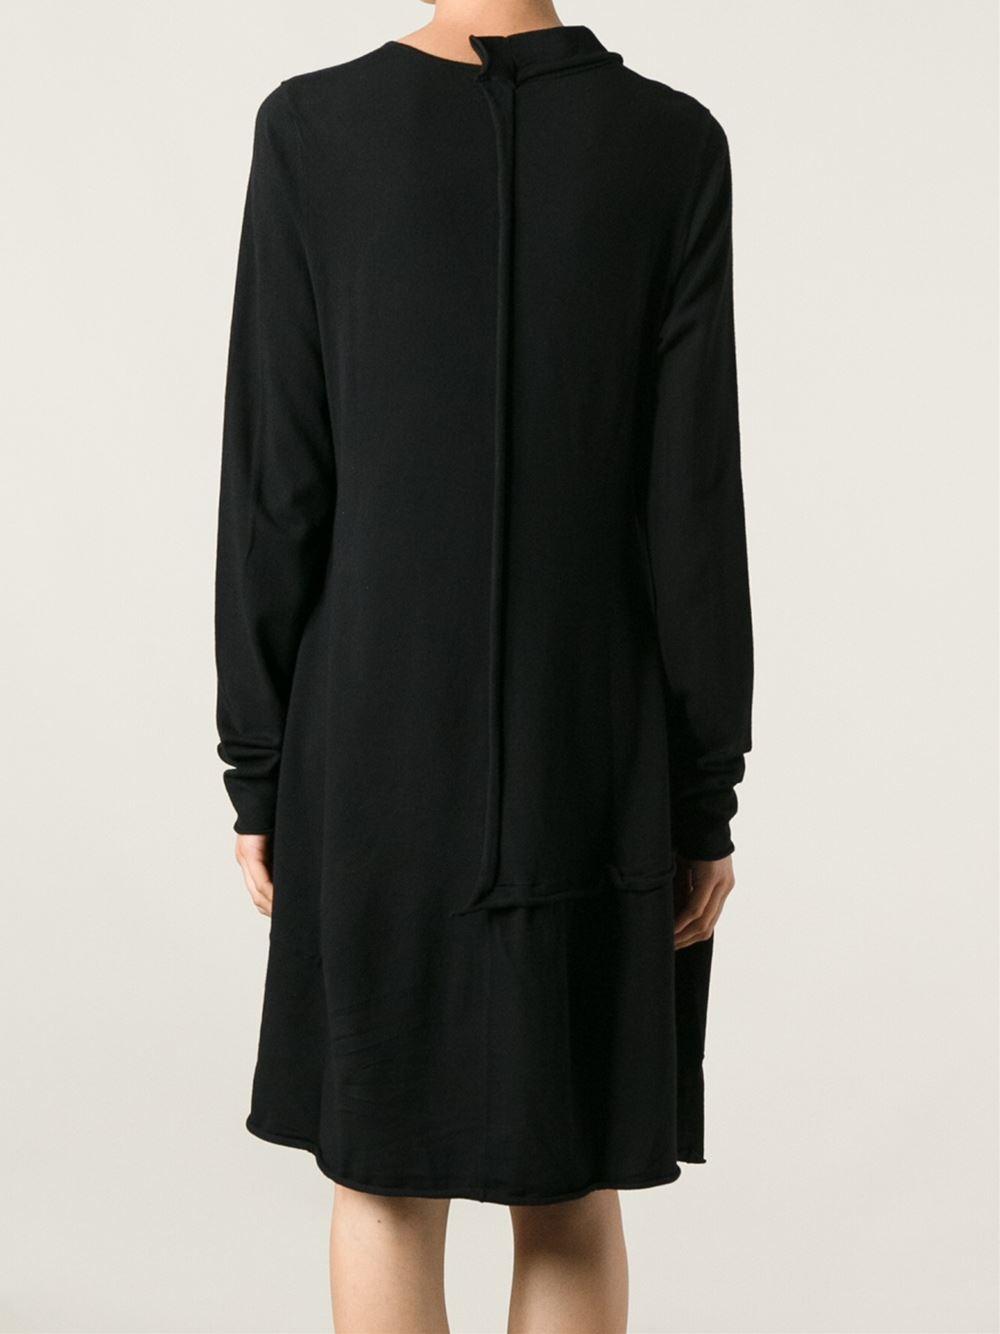 Rundholz Oversized Sweater Dress in Black | Lyst